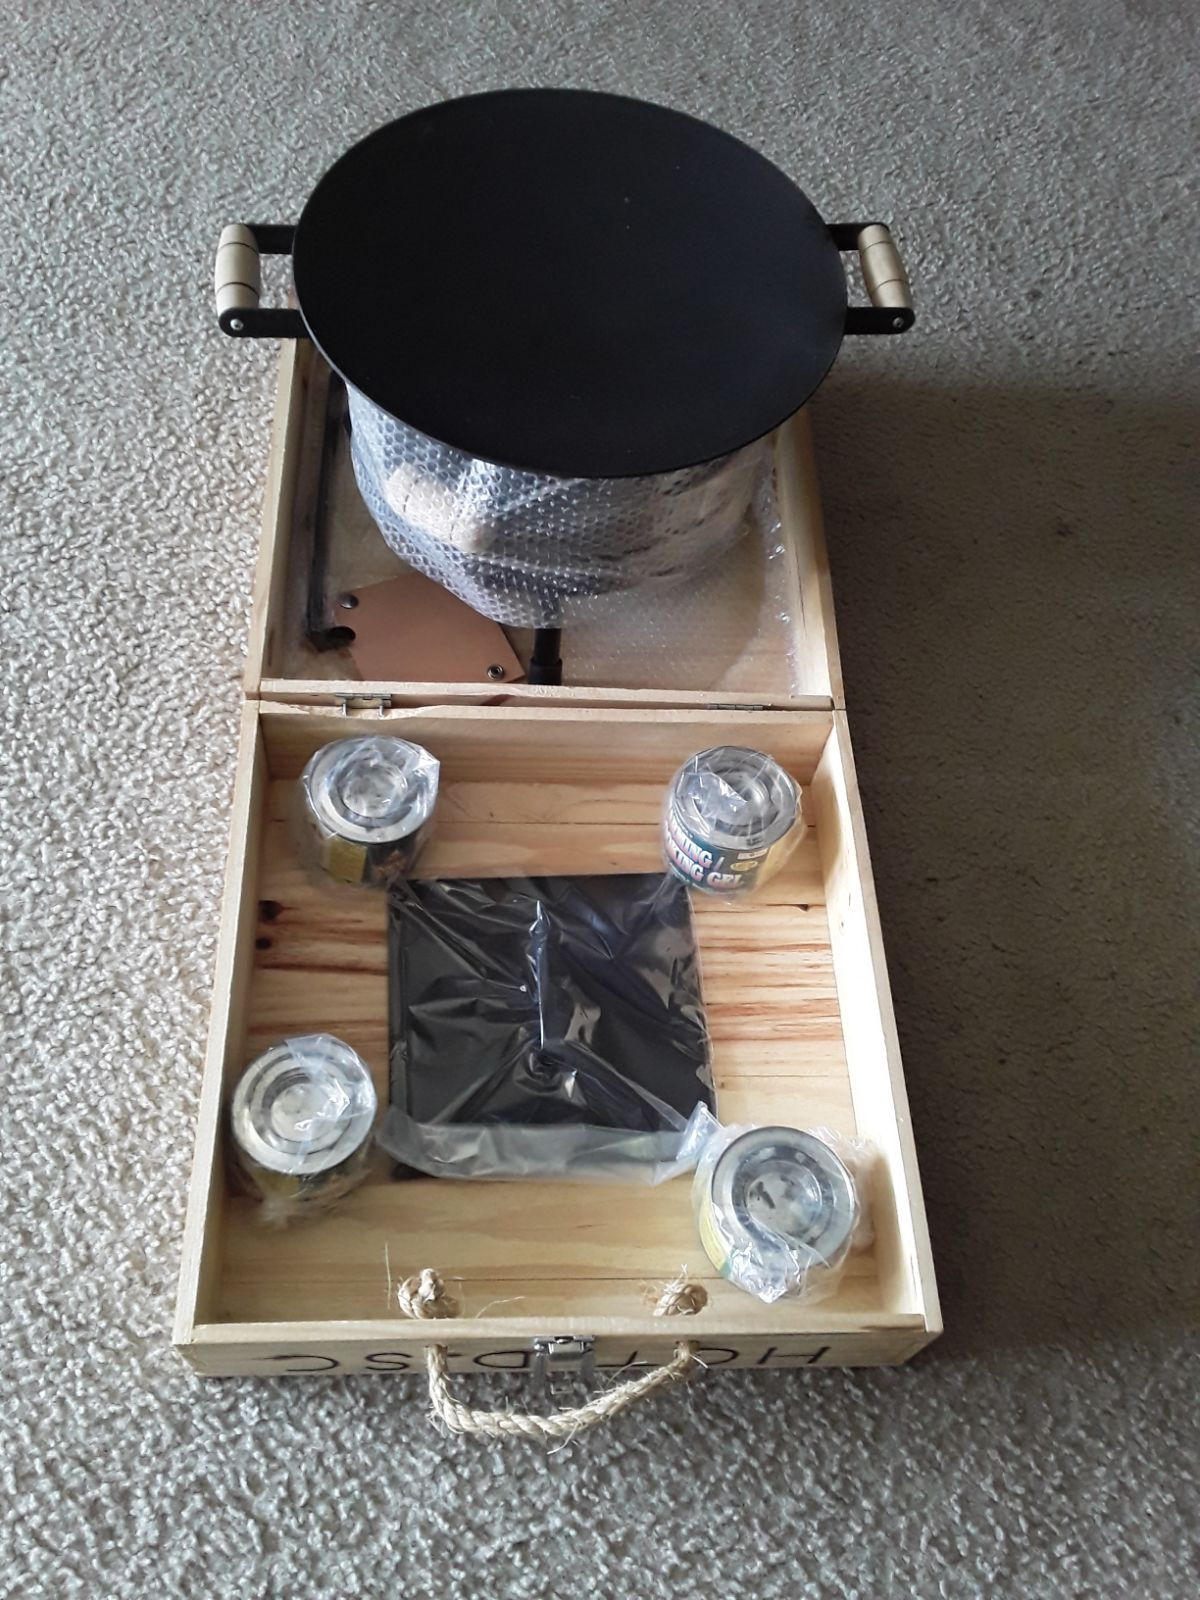 New era hot disc bbq grill